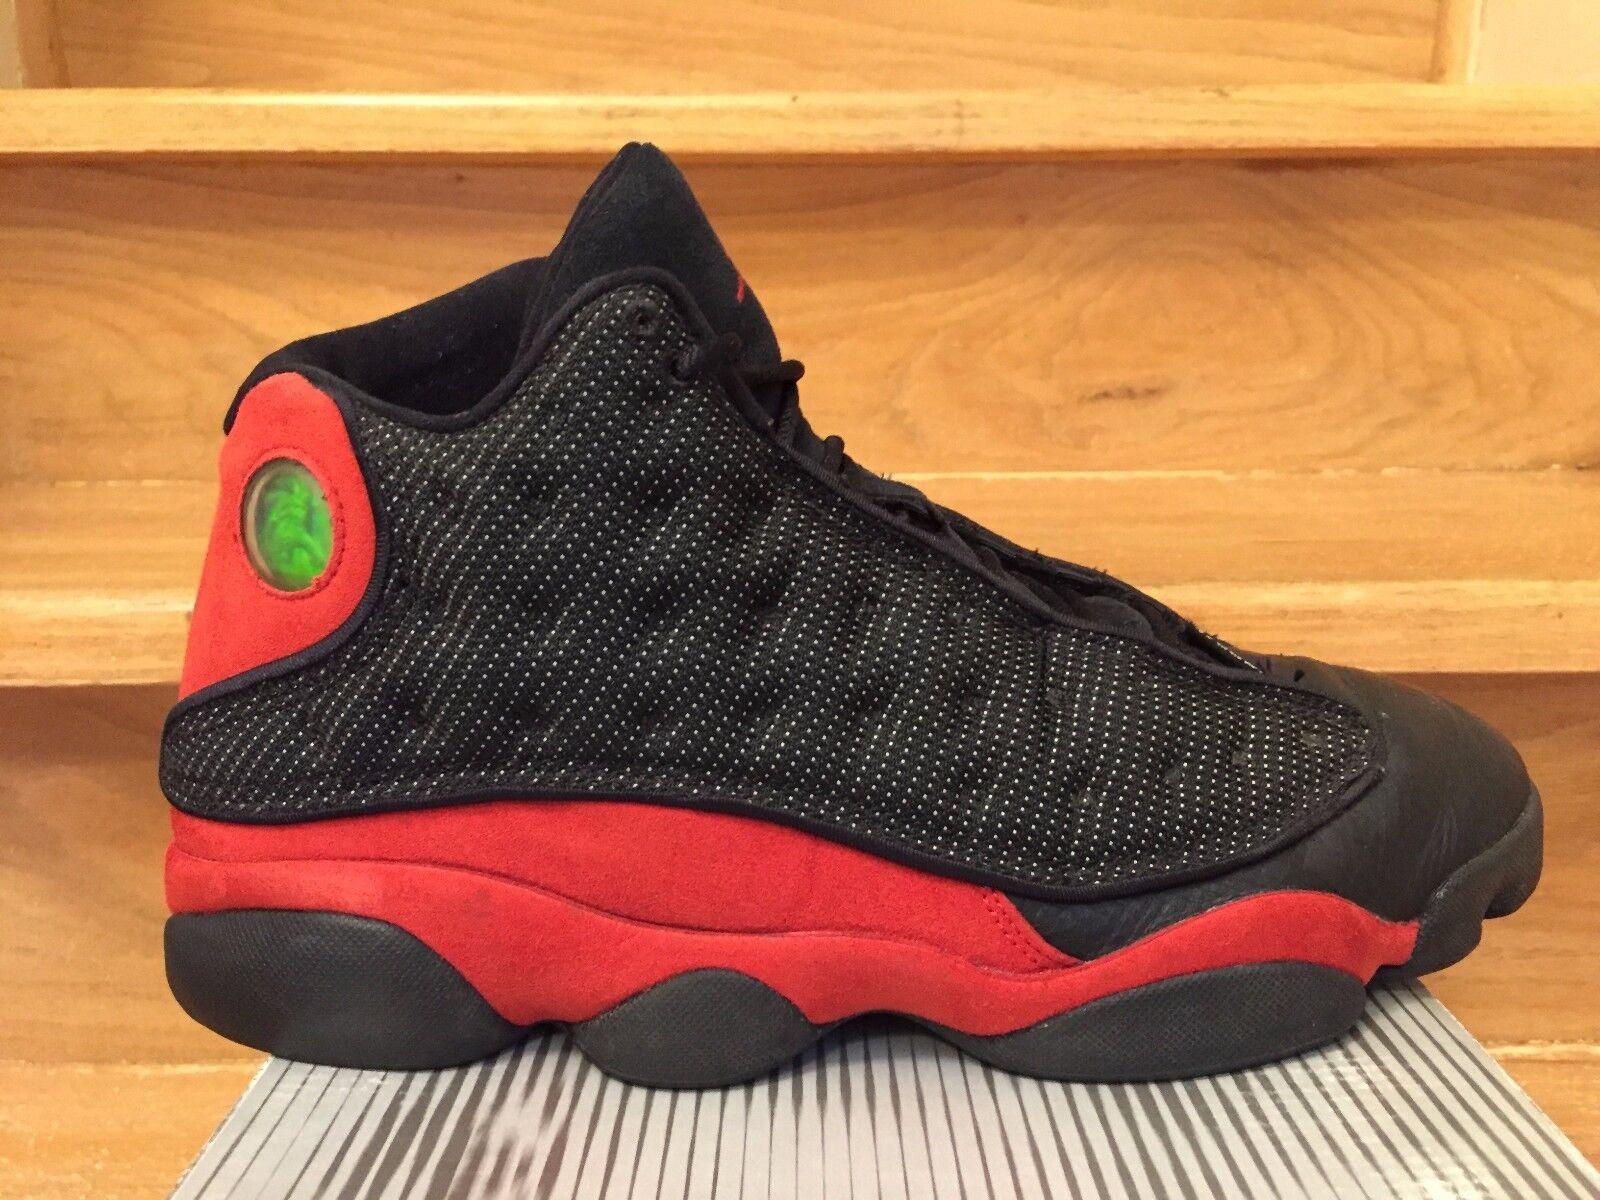 2004 - nike air jordan 13 retrò di razza nera / vero red / 3m riflettenti, numero di scarpe